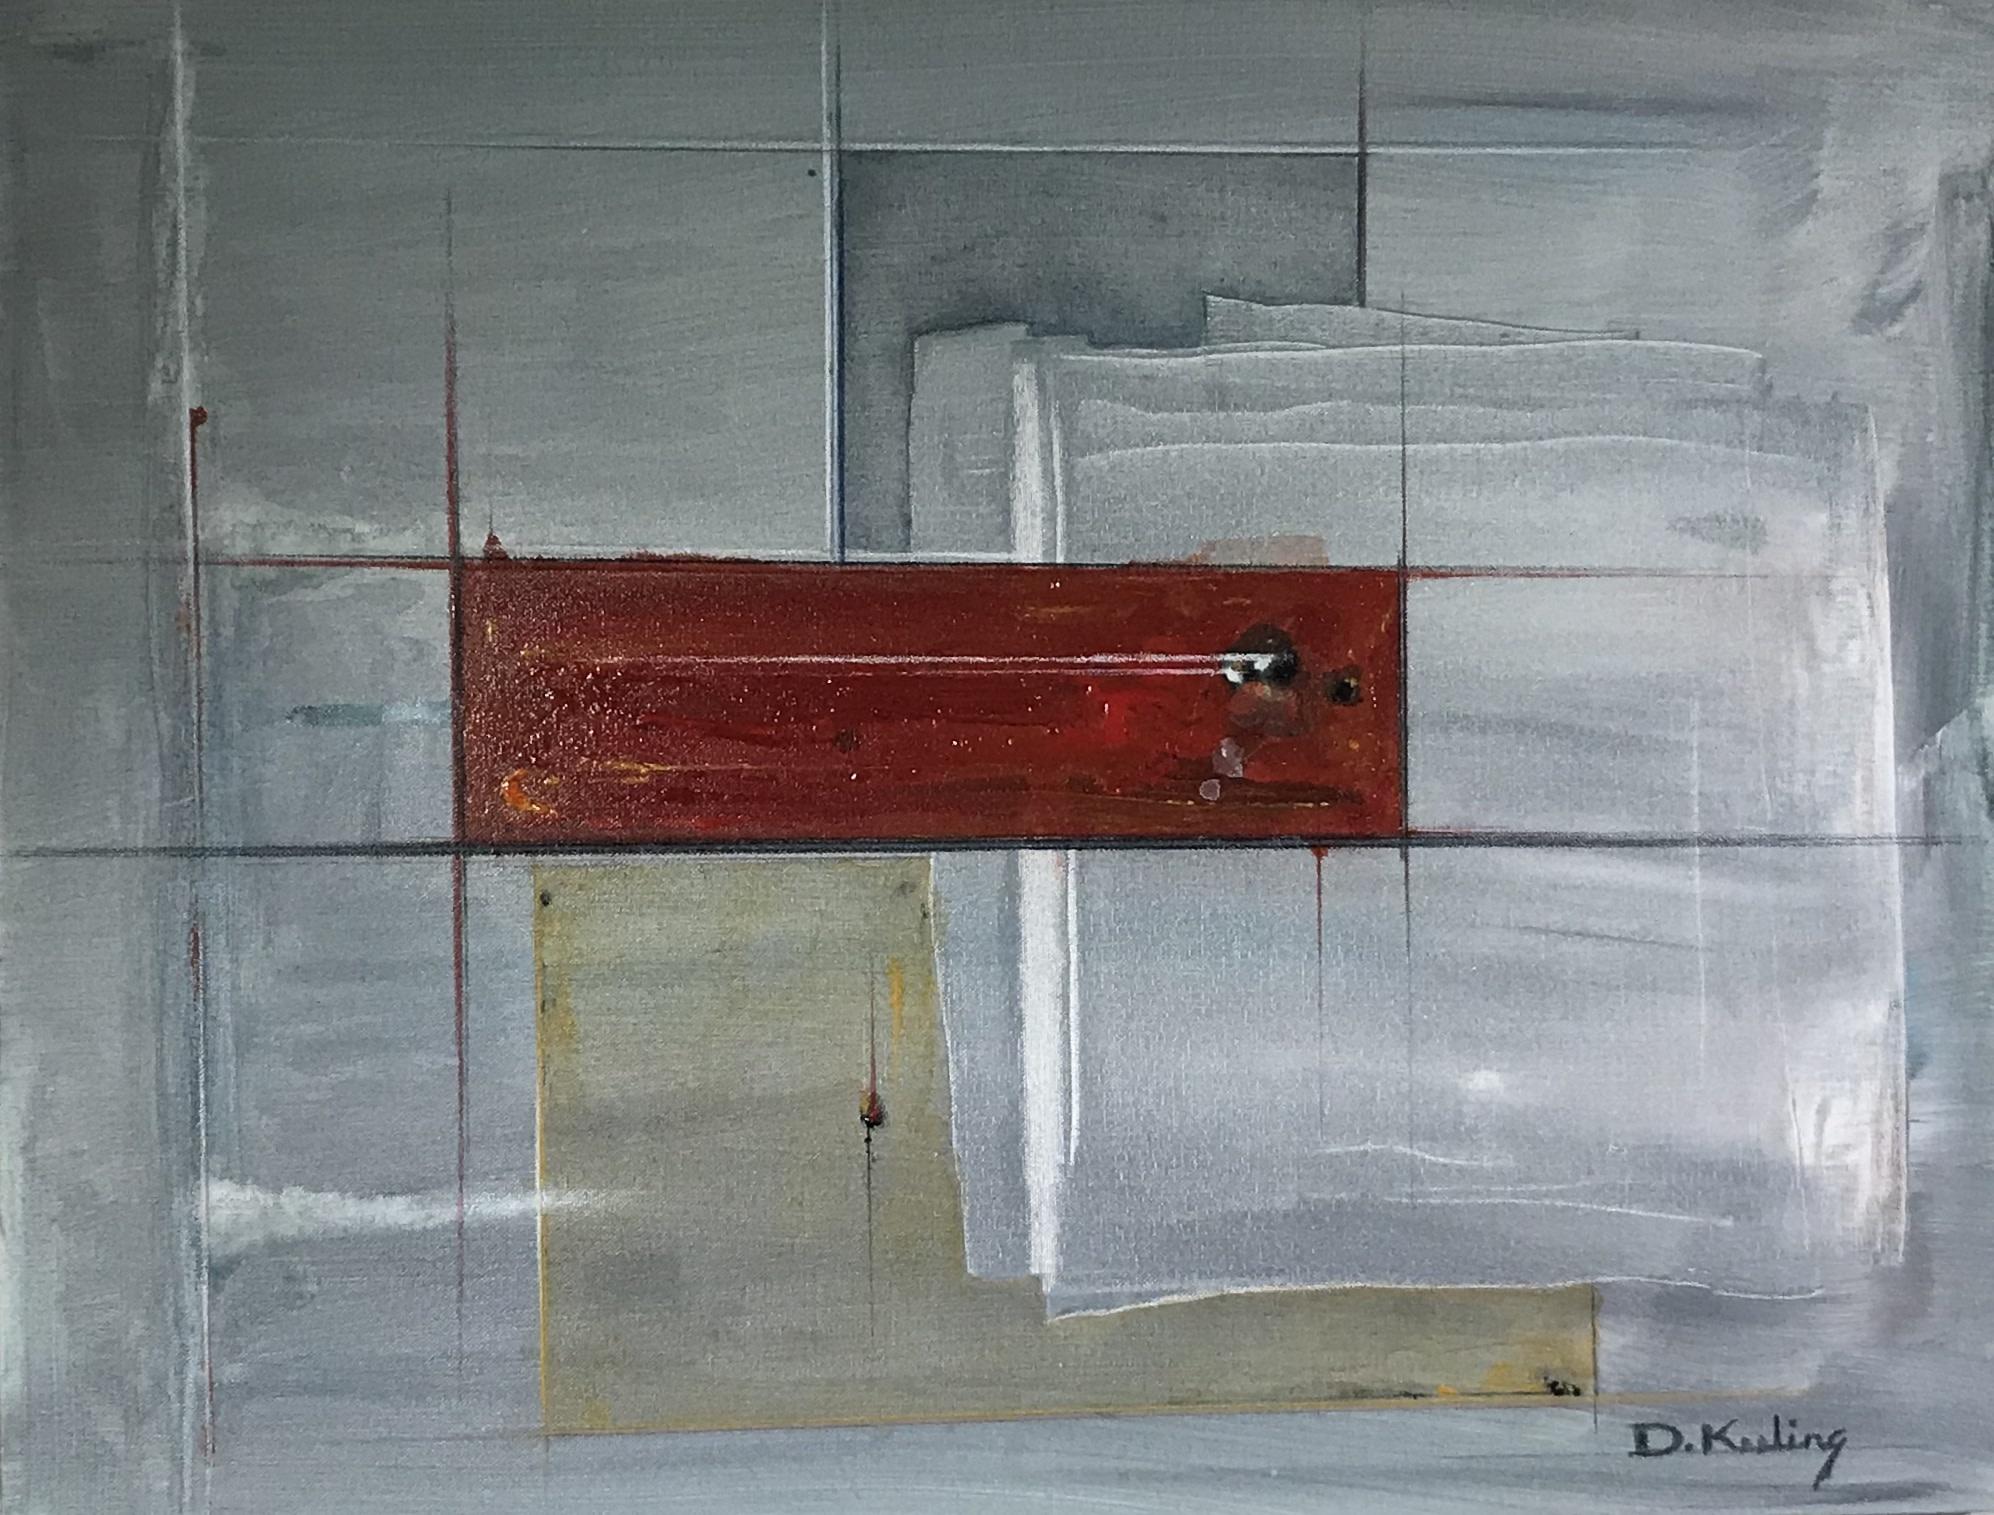 Doug Keeling Untitiled D. Keeling